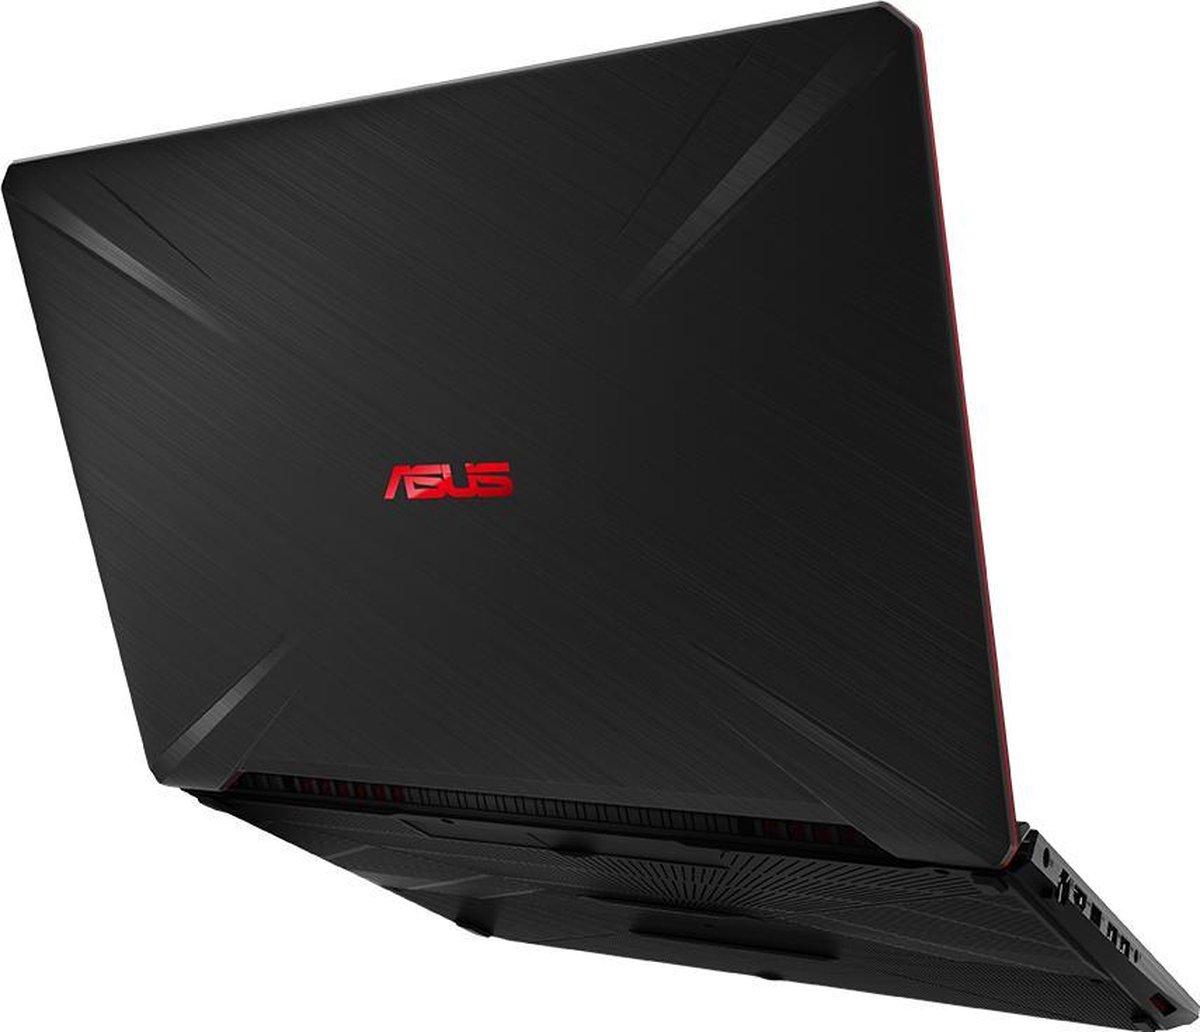 Bol Com Asus Tuf Fx705gd Ew106t Gaming Laptop 17 3 Inch